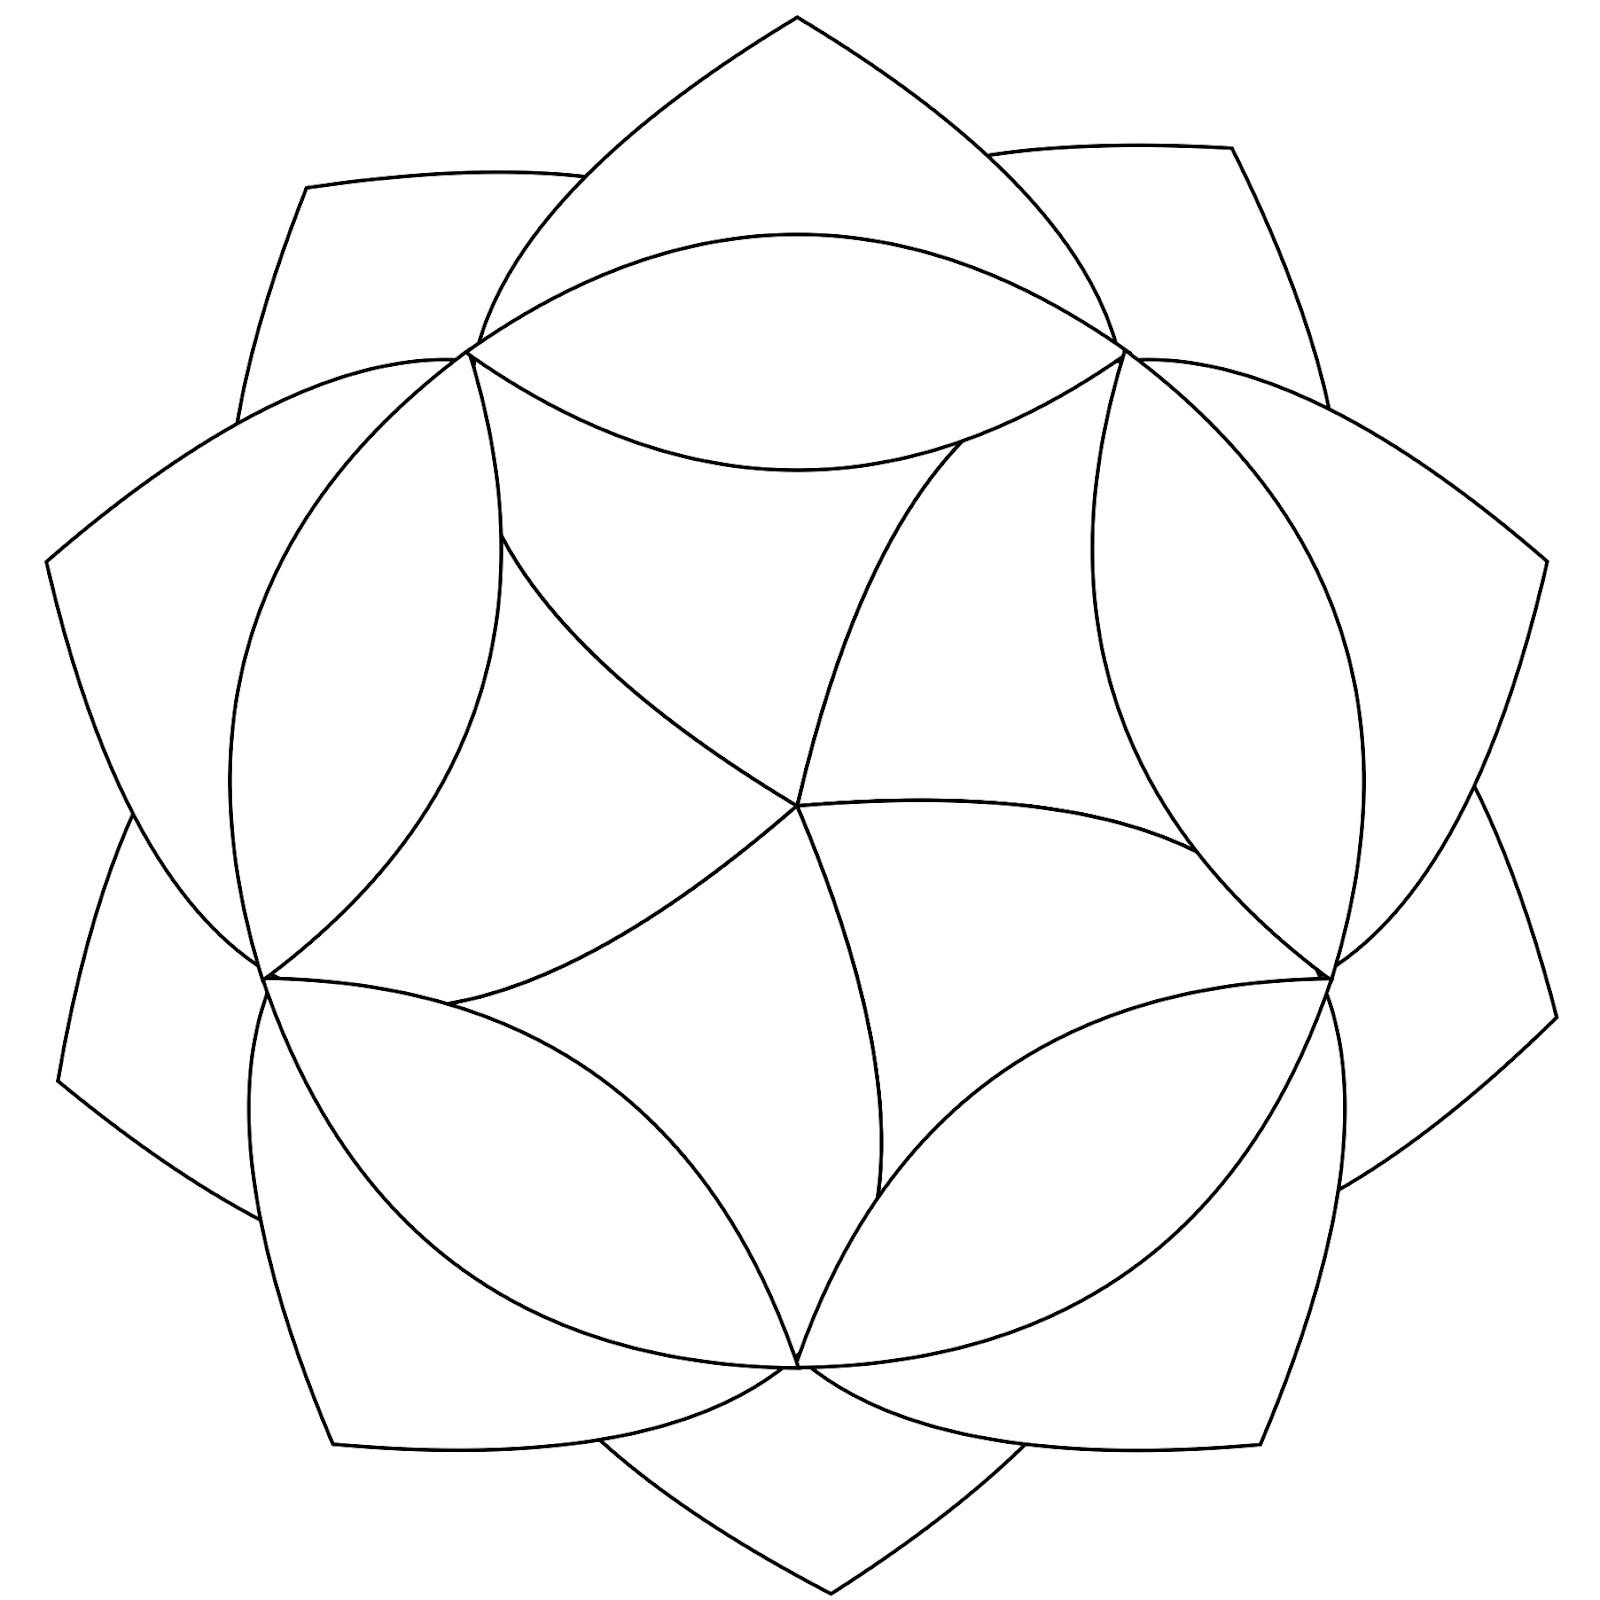 Tangled Planet: Zendala Class